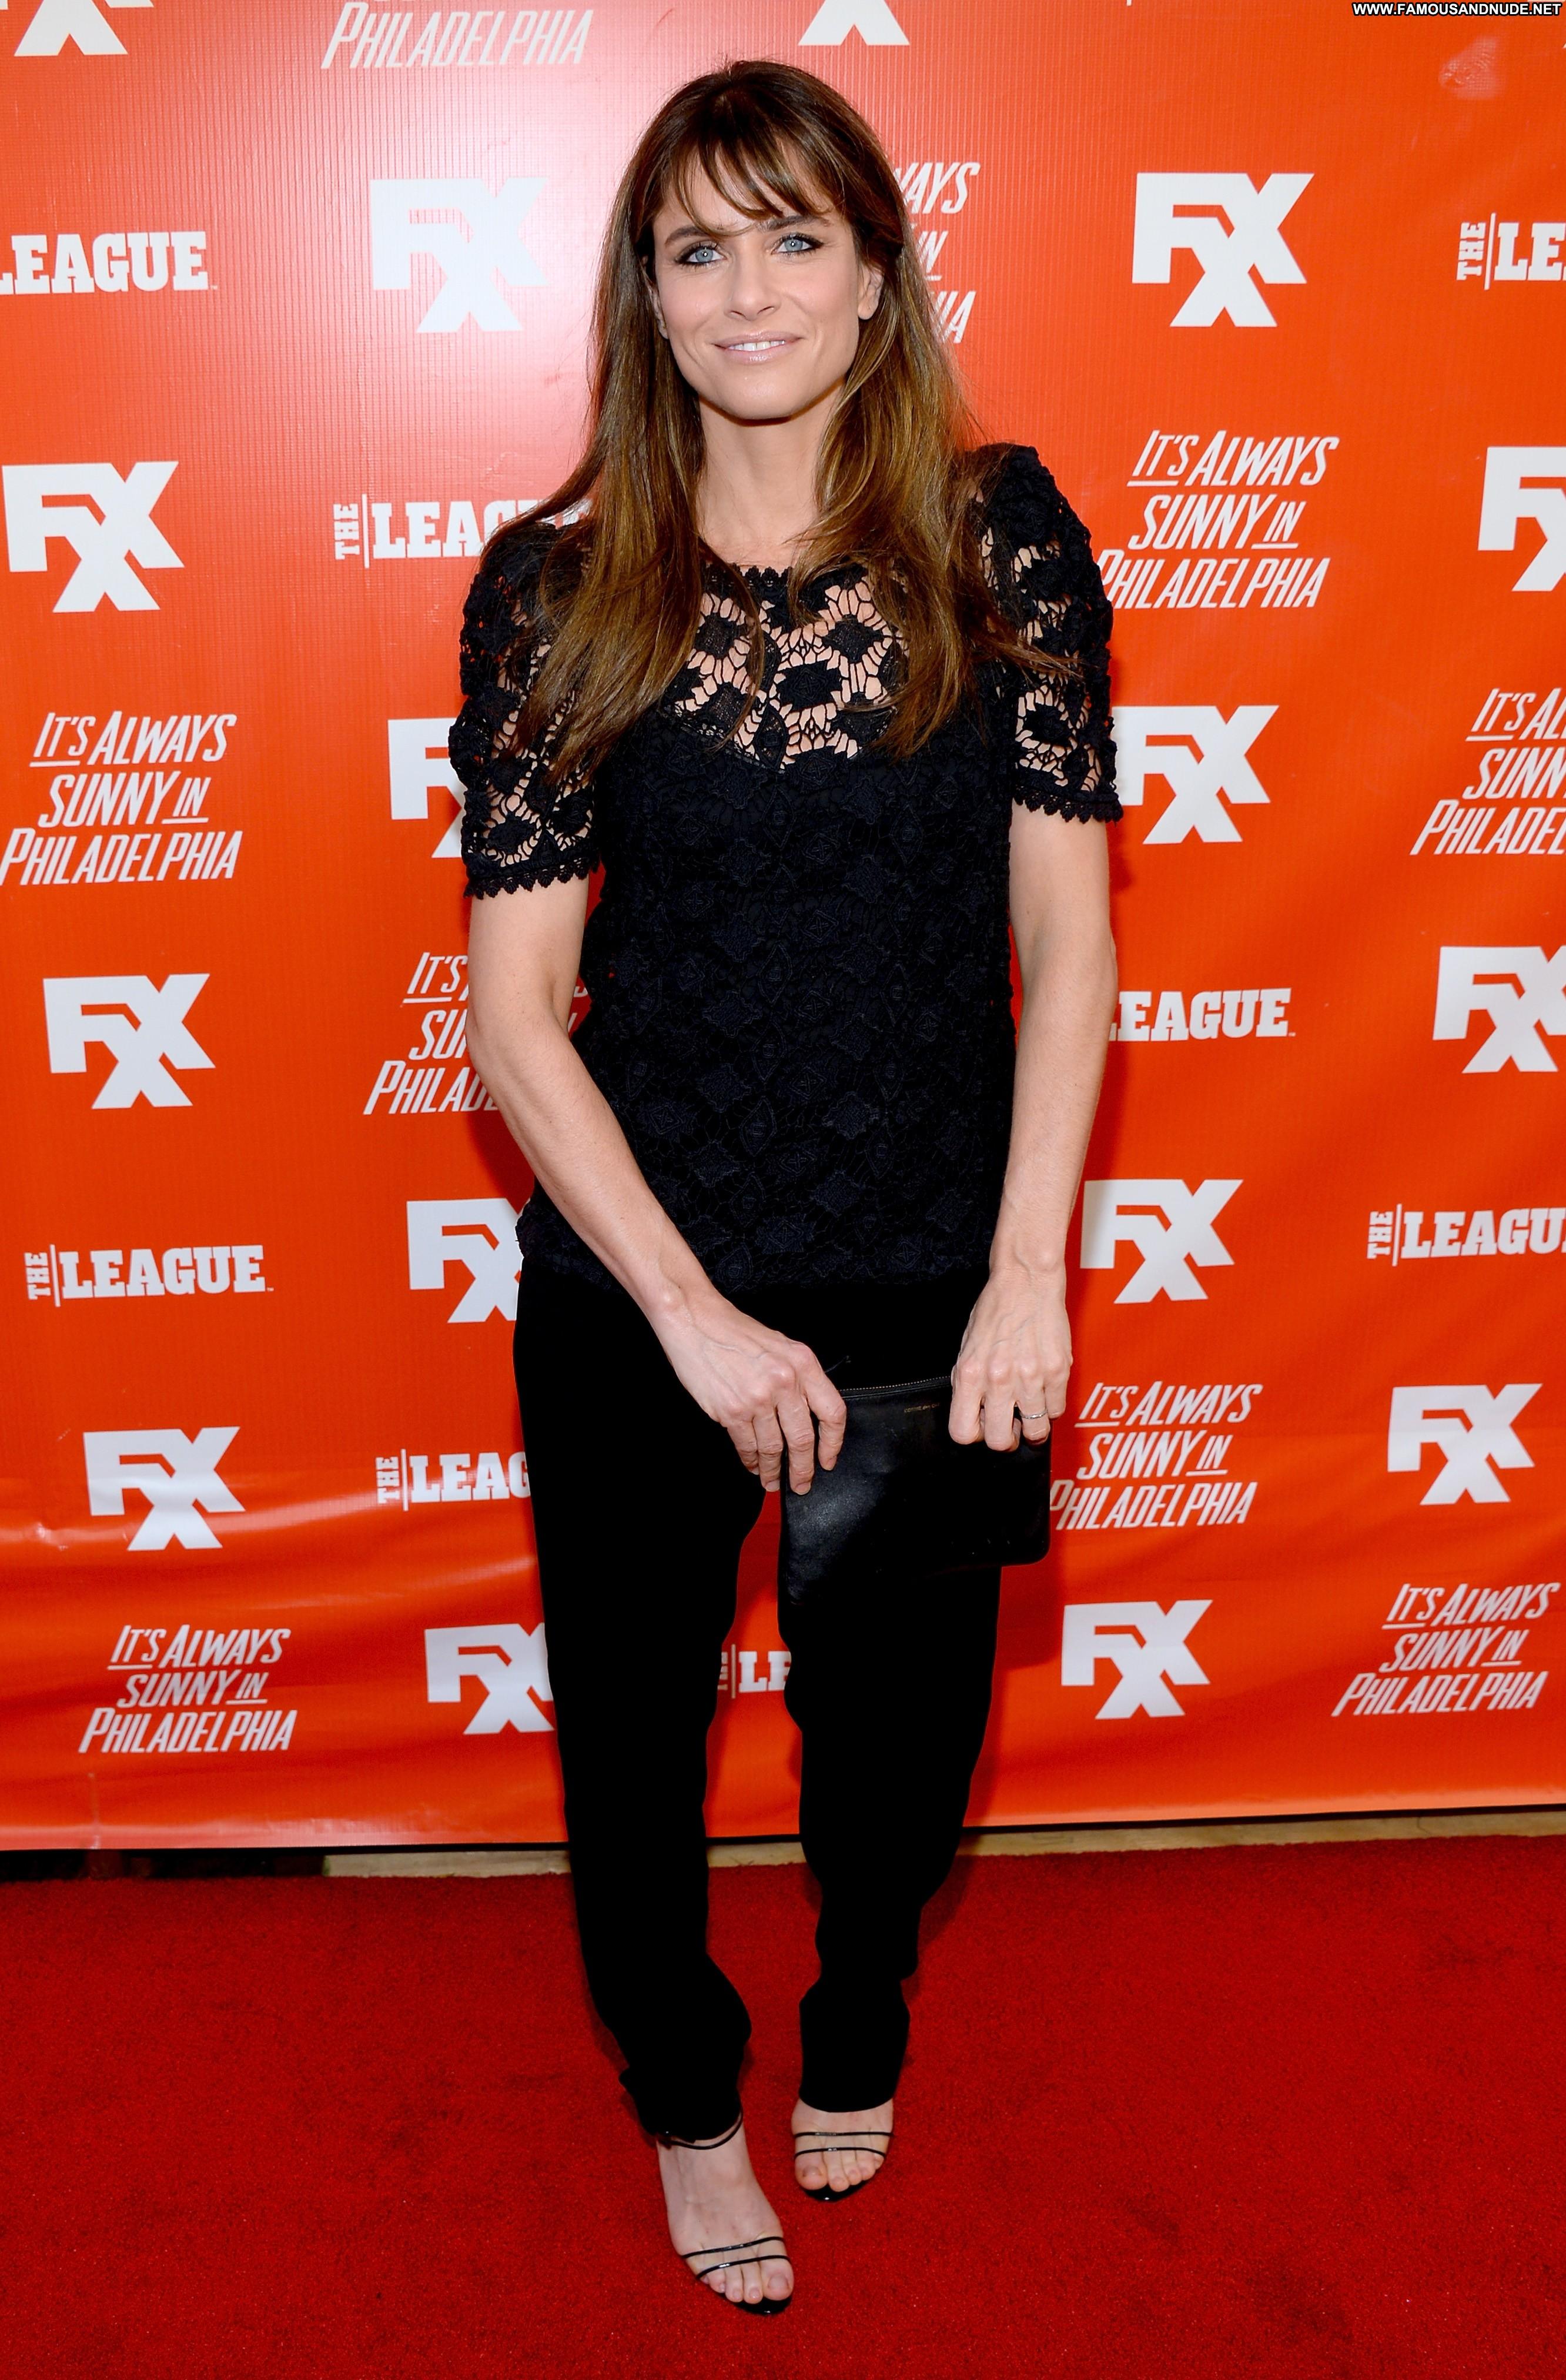 Amanda Peet No Source Celebrity Beautiful Sexy Babe Posing Hot